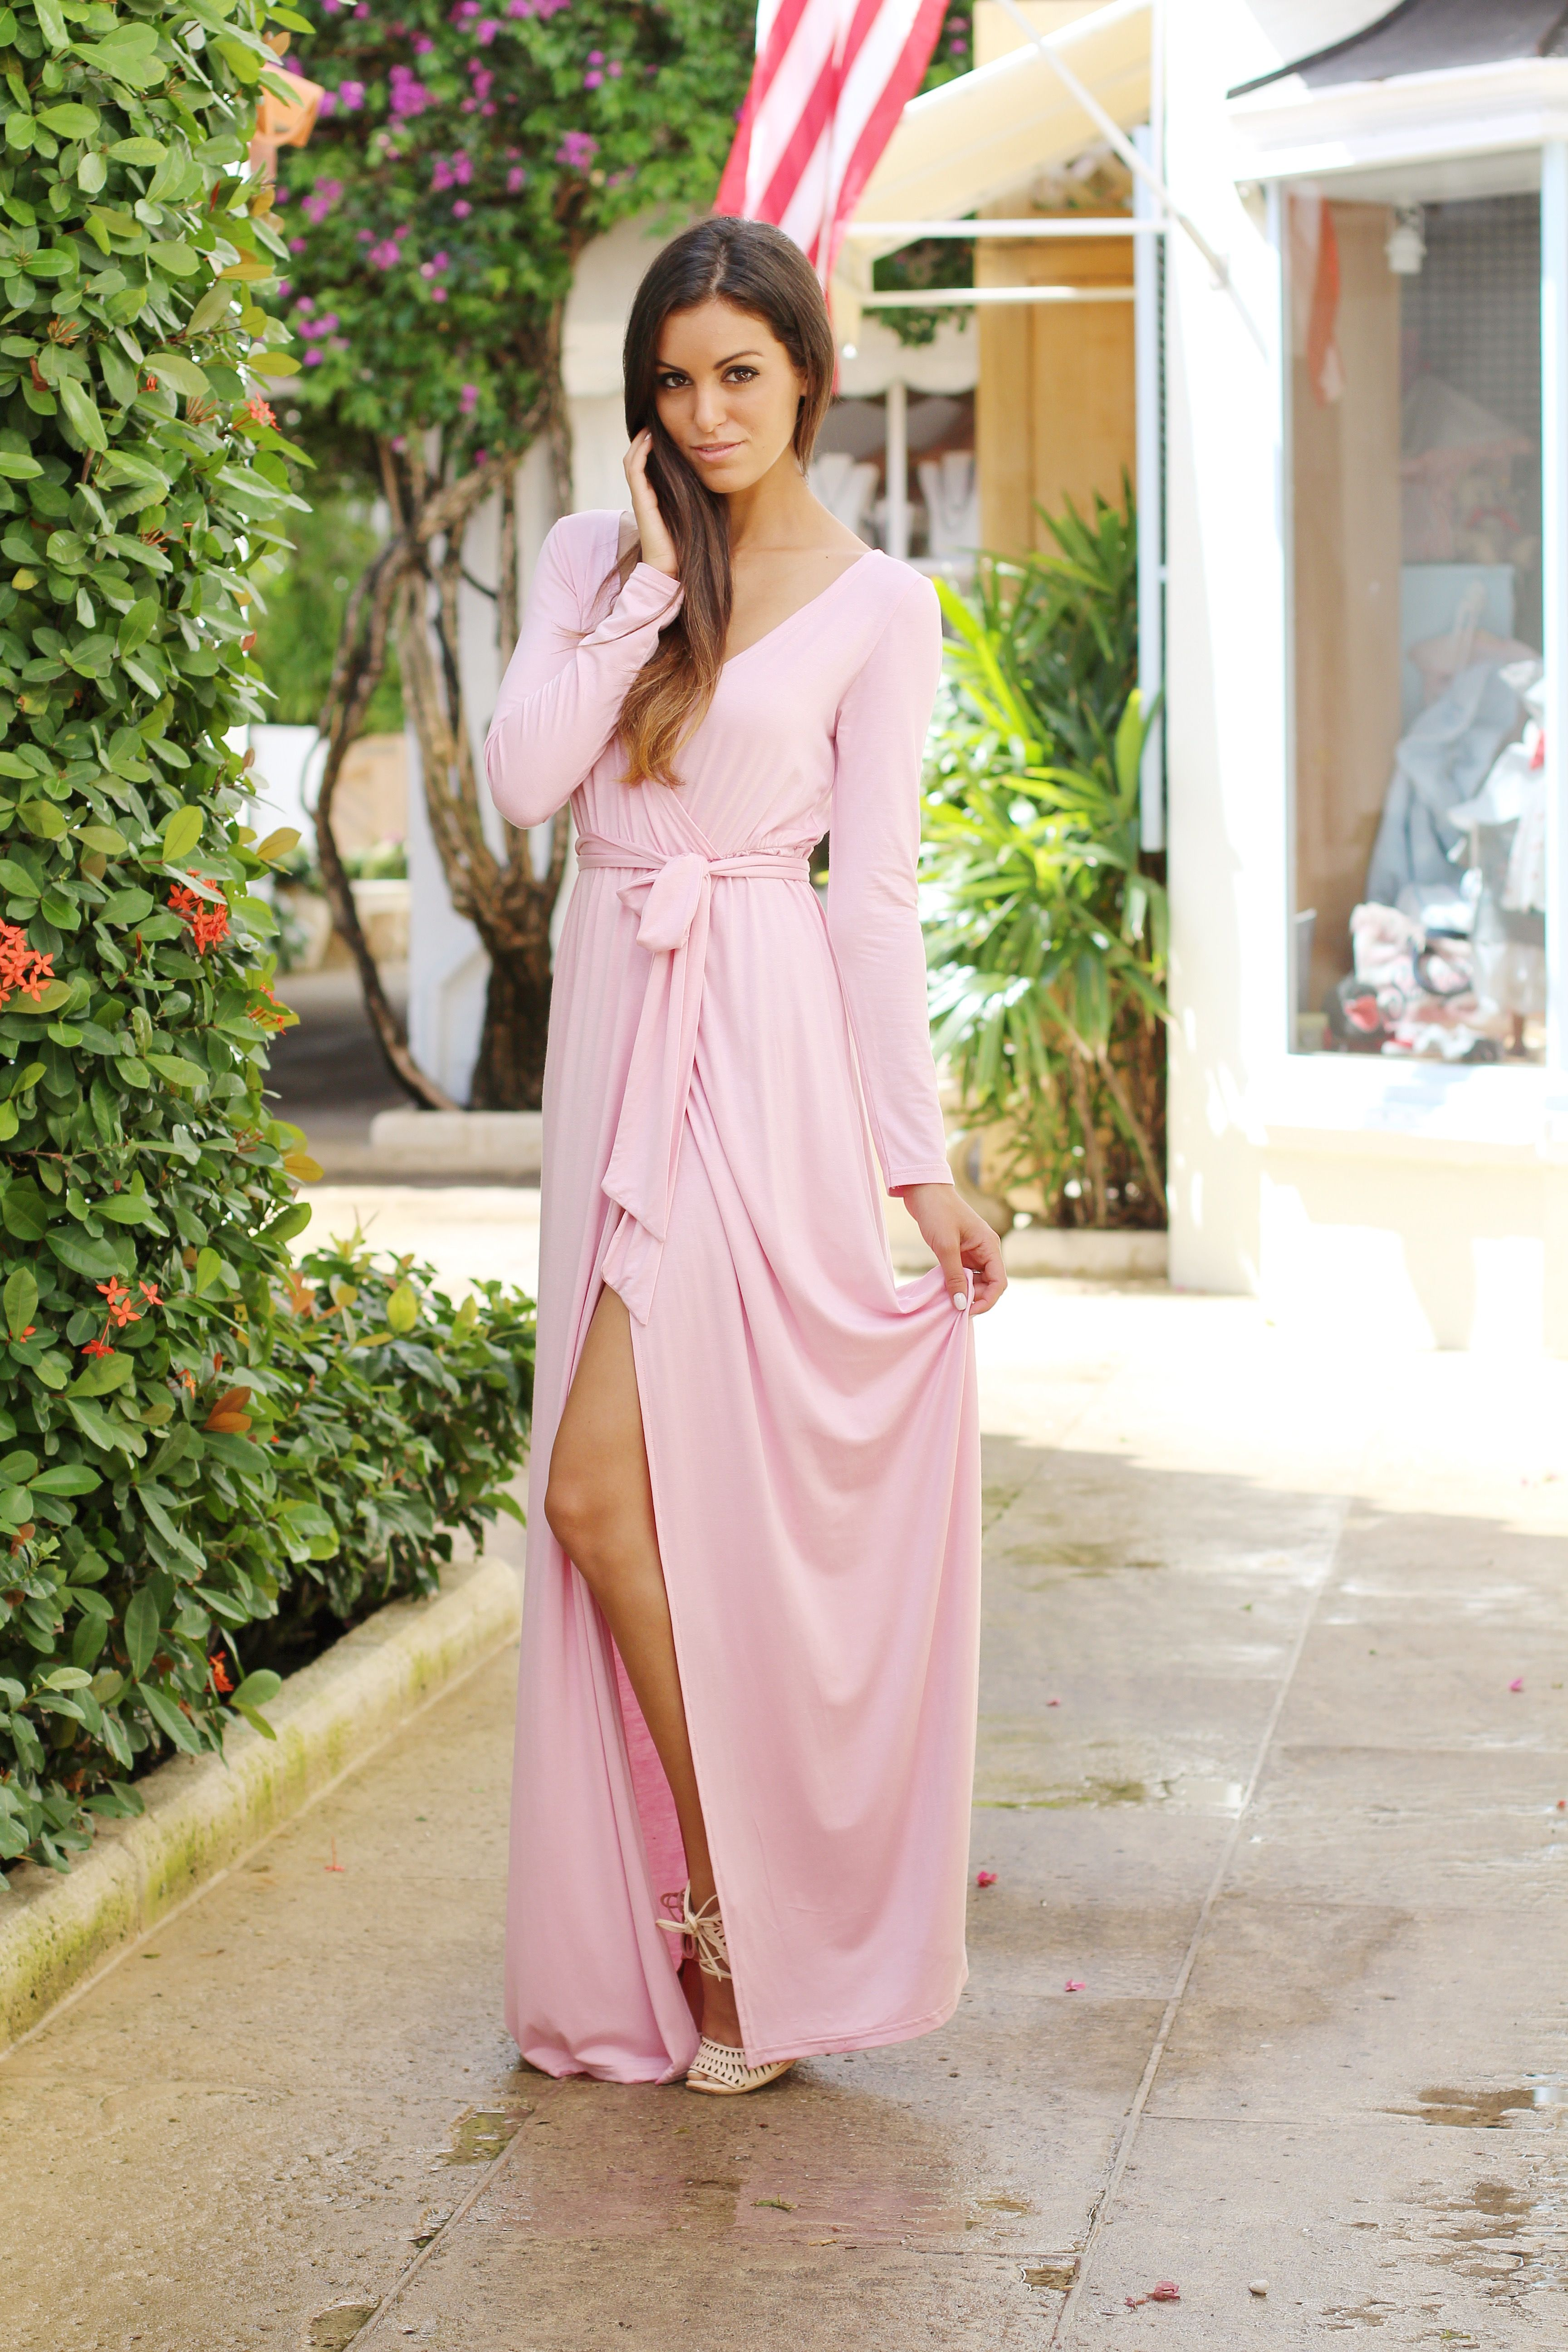 fdcd50b9bd4e Pink maxi dress with long sleeves and leg slit | Farrah | escloset.com